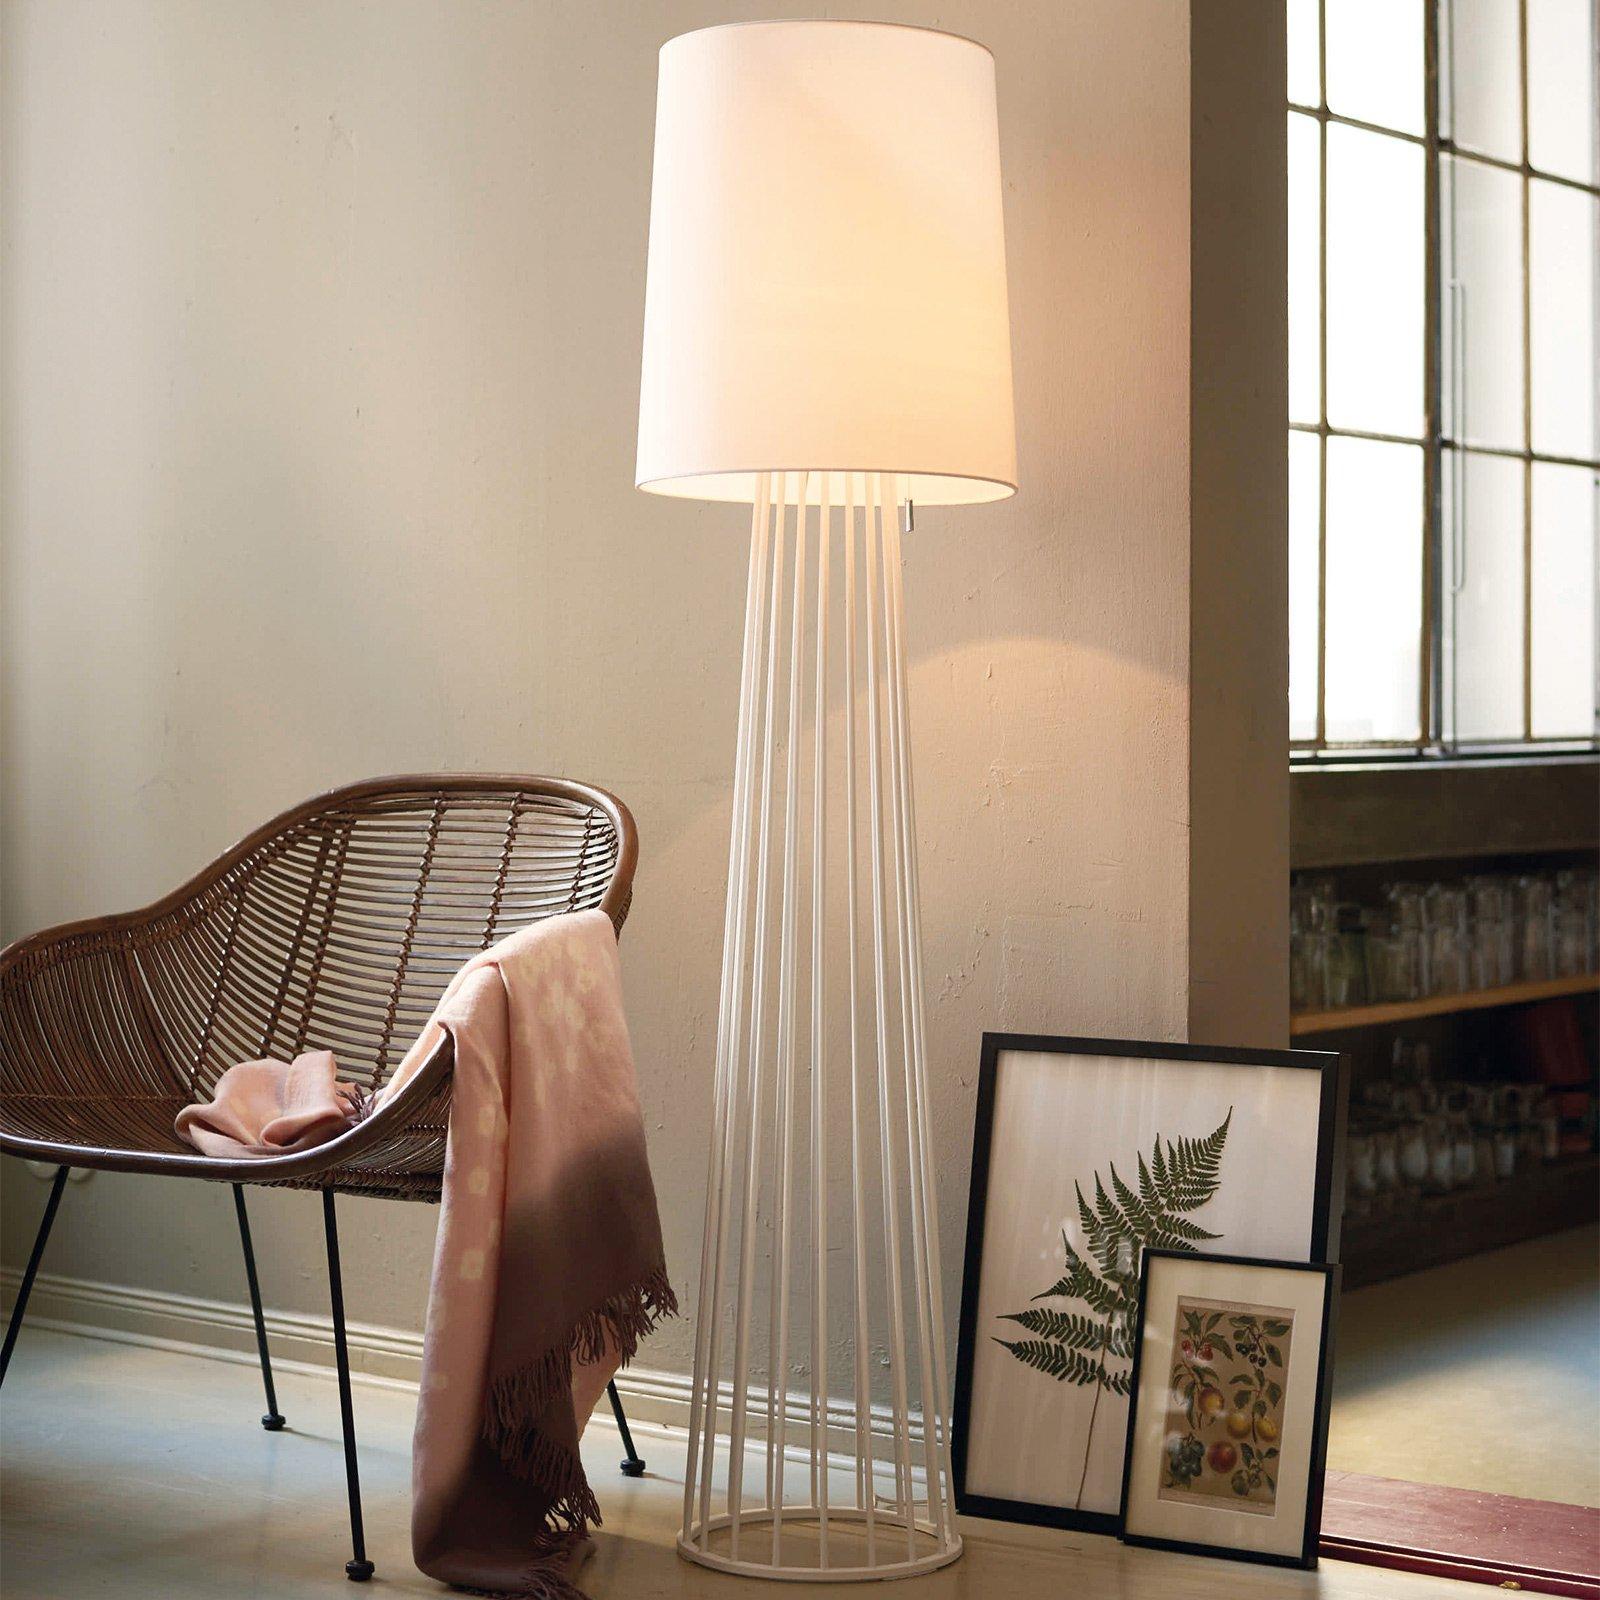 Villeroy & Boch Mailand gulvlampe tekstilskjerm